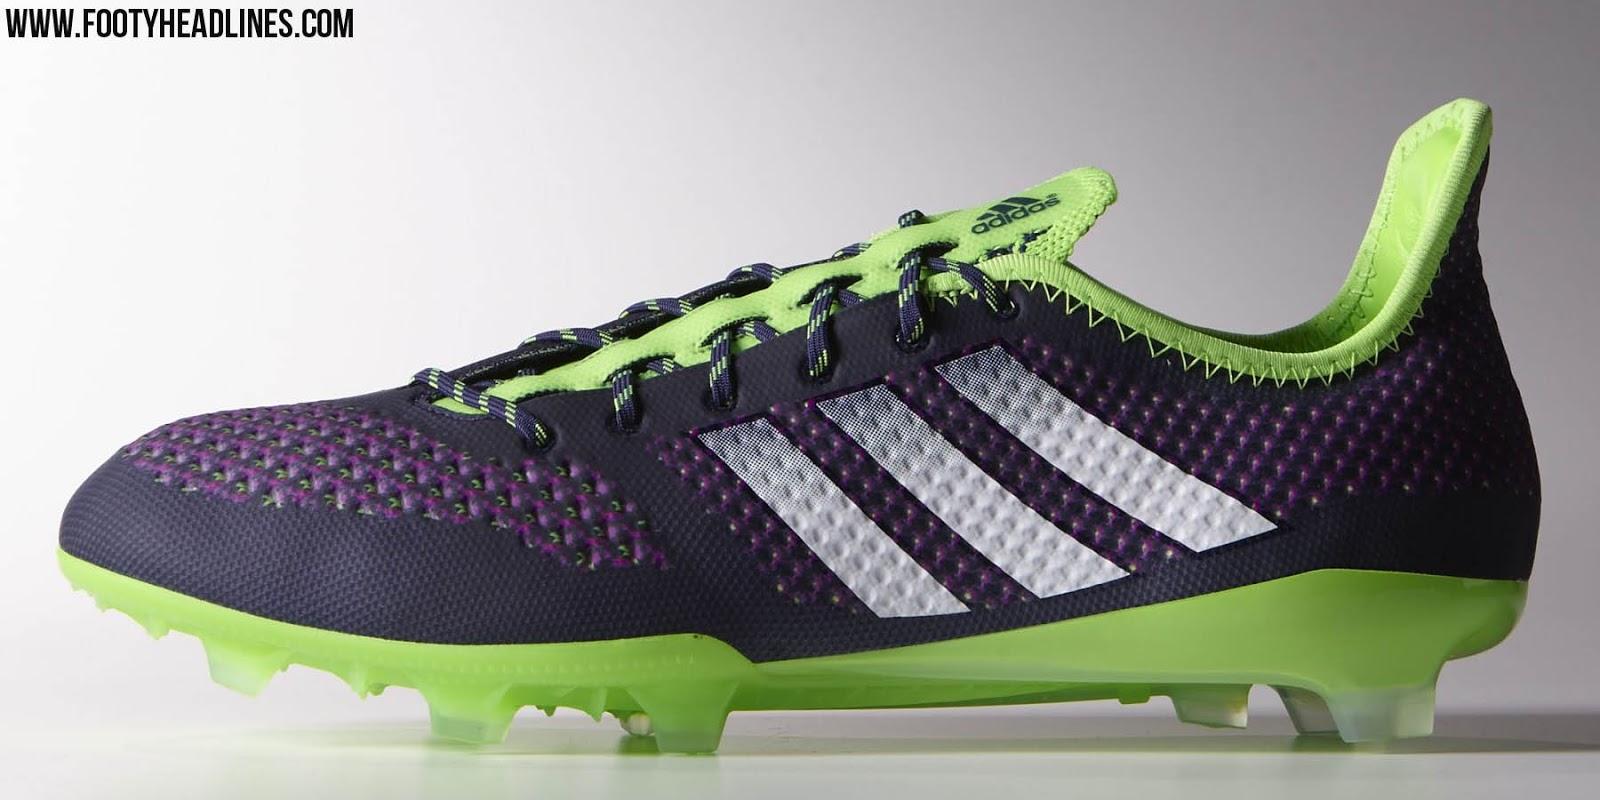 adidas primeknit 20 2015 boots released footy headlines